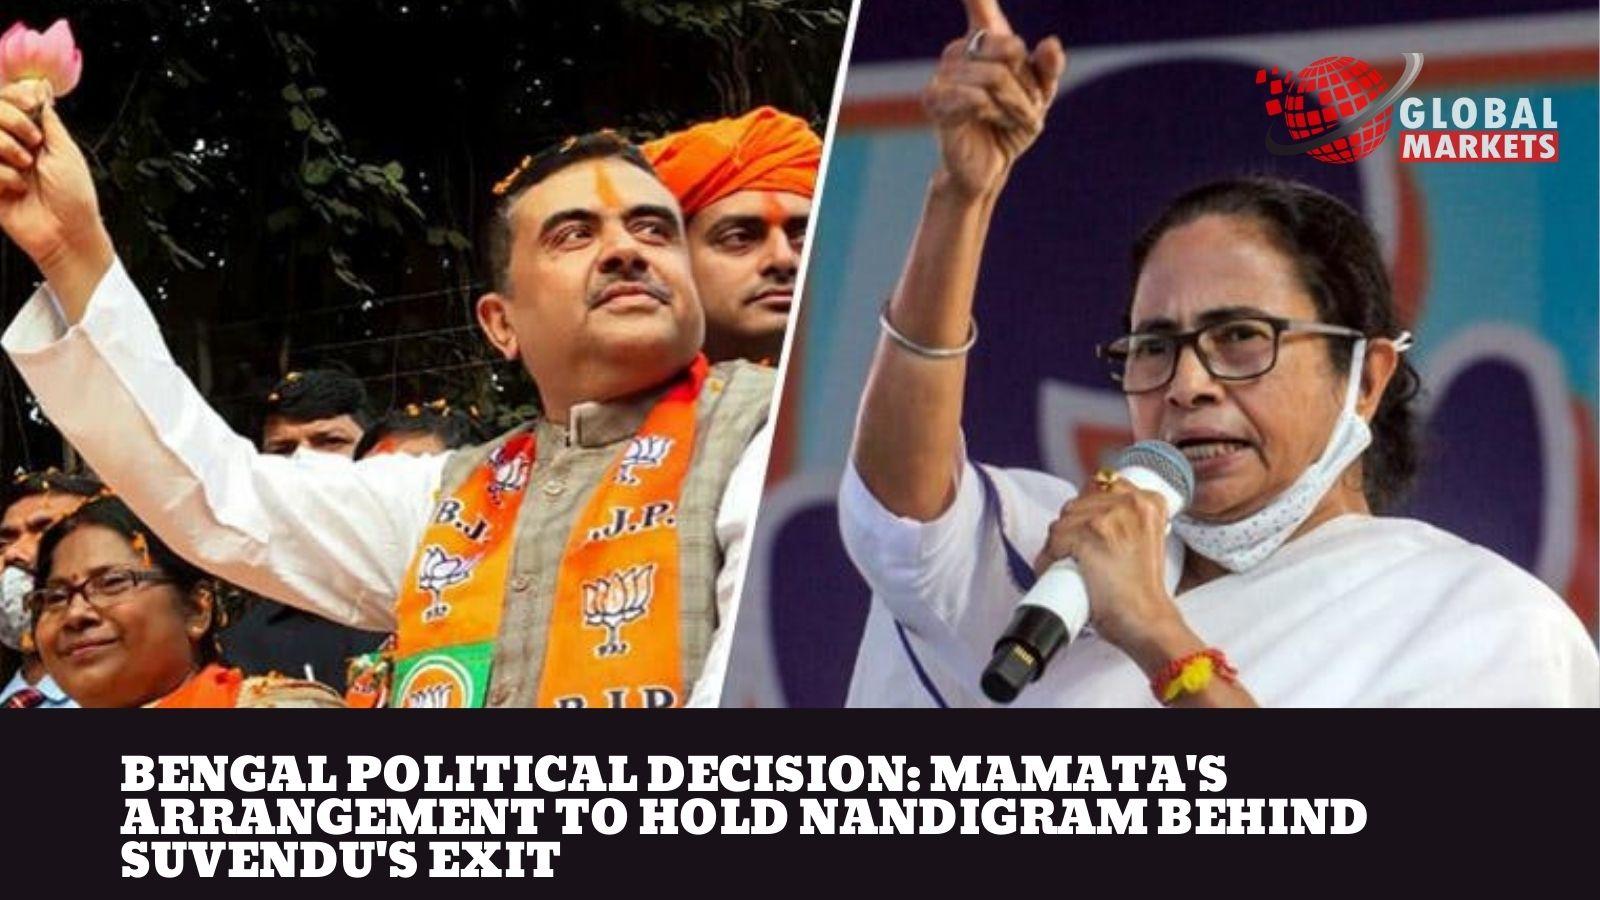 Mamata's arrangement to hold Nandigram behind Suvendu's exit